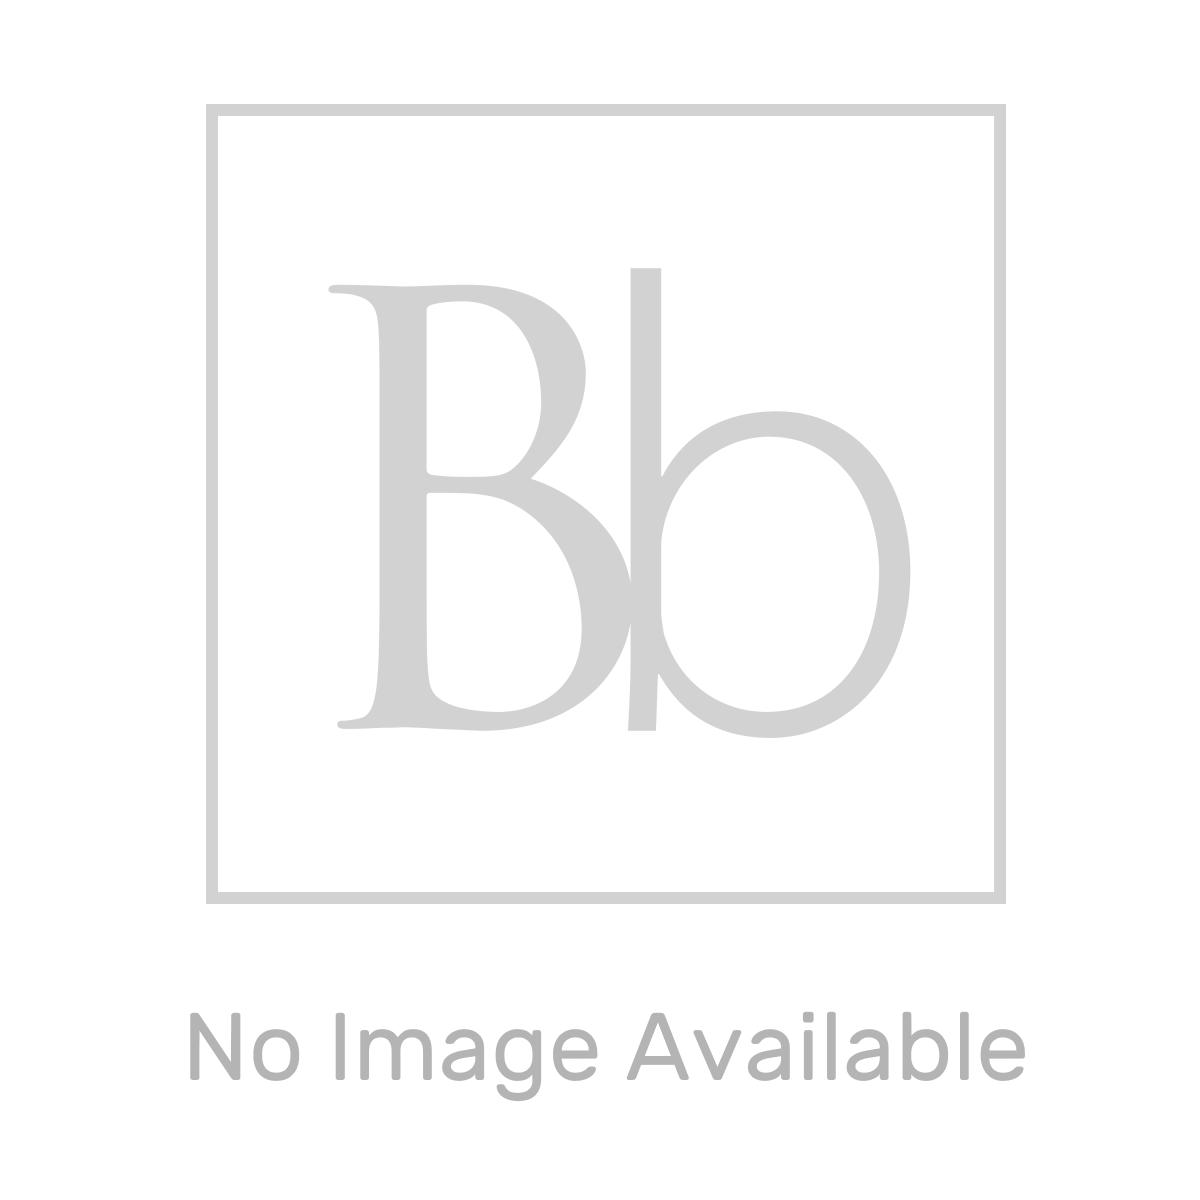 RAK Moon Toilet Brush with Holder